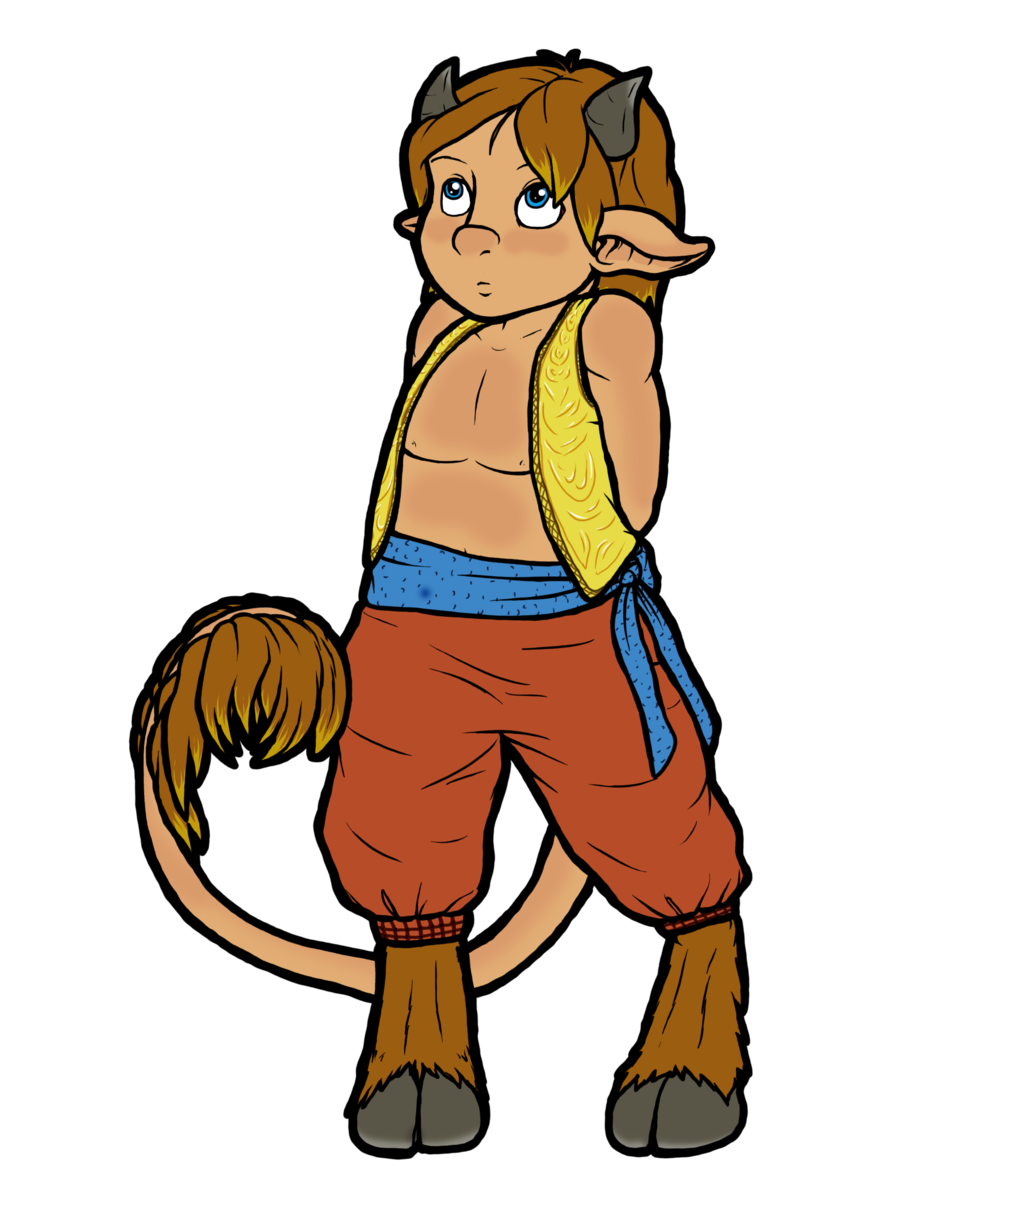 Featured image: Little Irayo